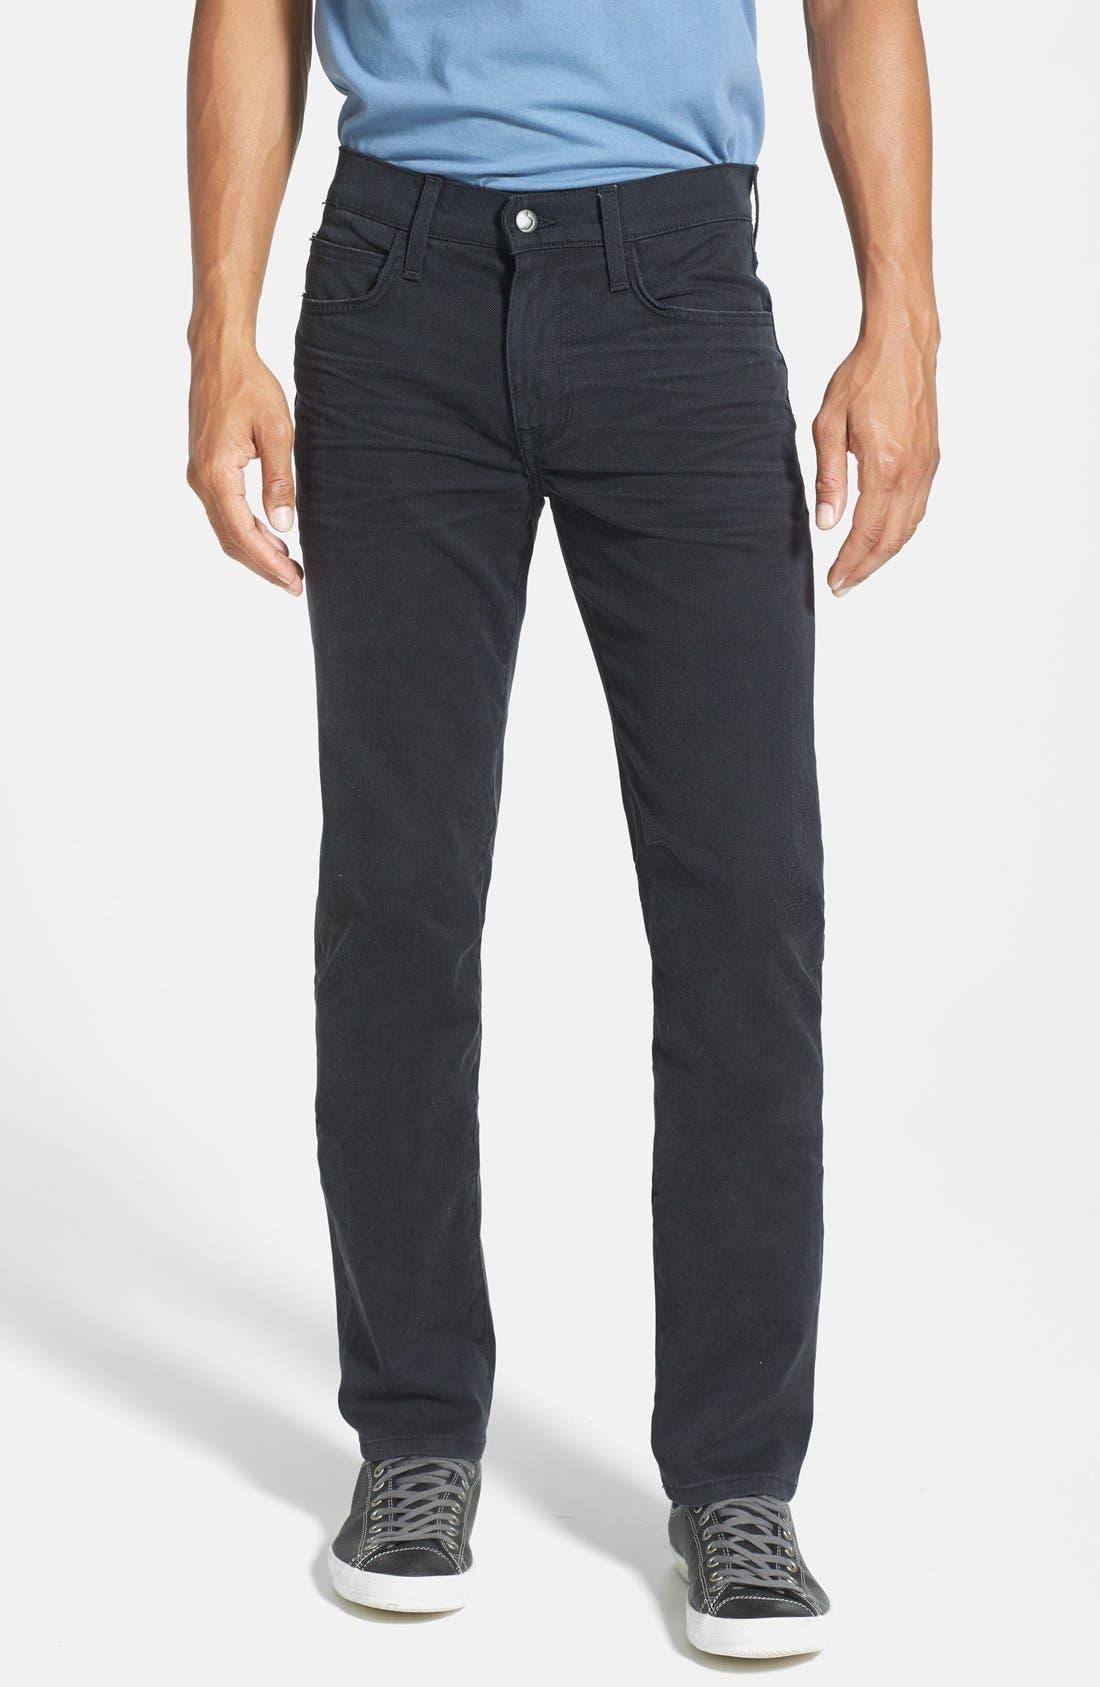 Alternate Image 1 Selected - Joe's 'Brixton' Slim Fit Jeans (Feras)